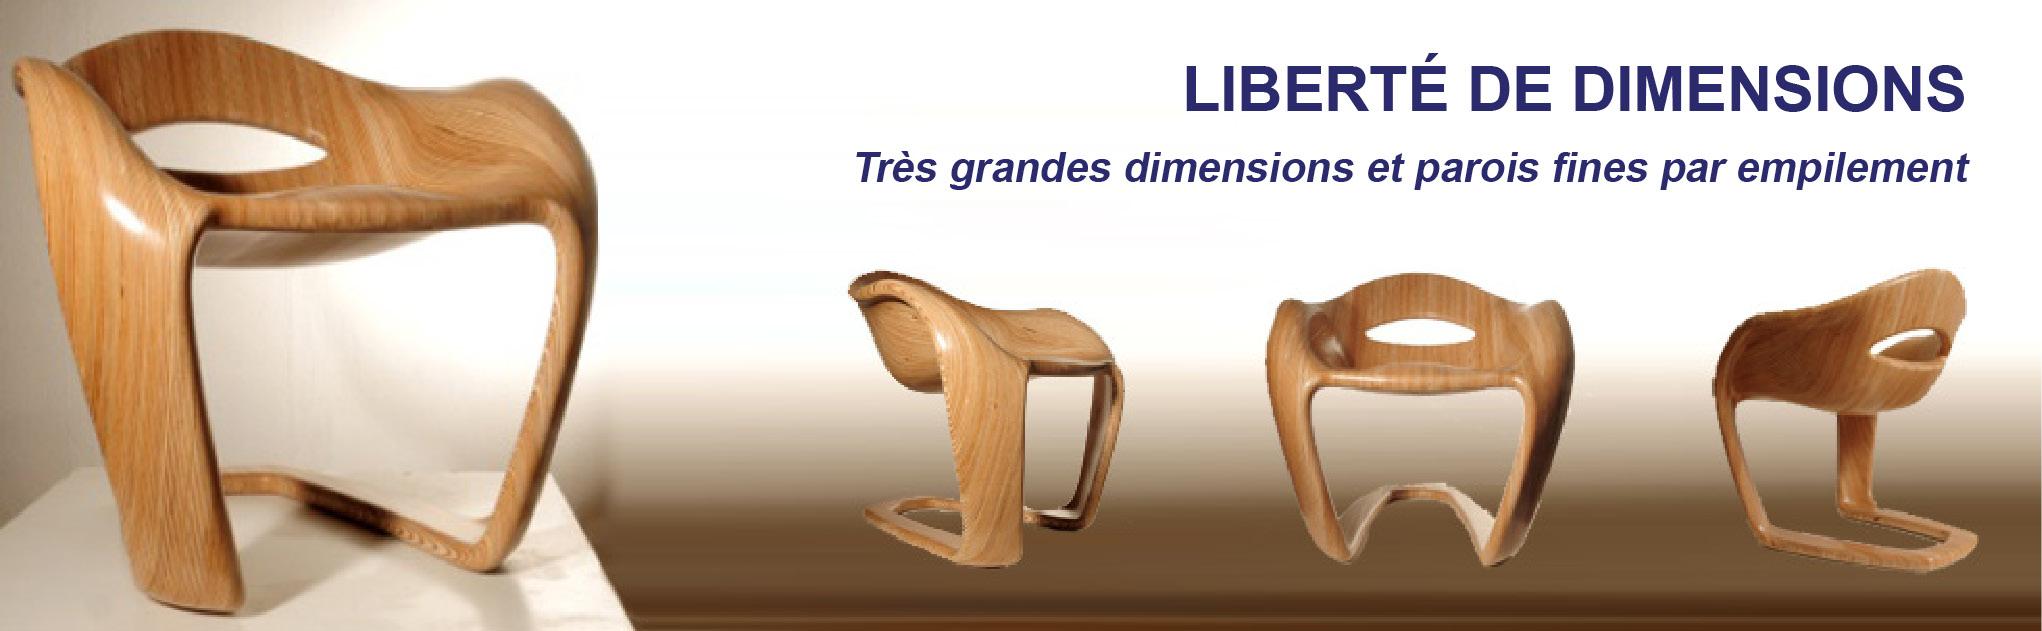 Liberté de dimensions